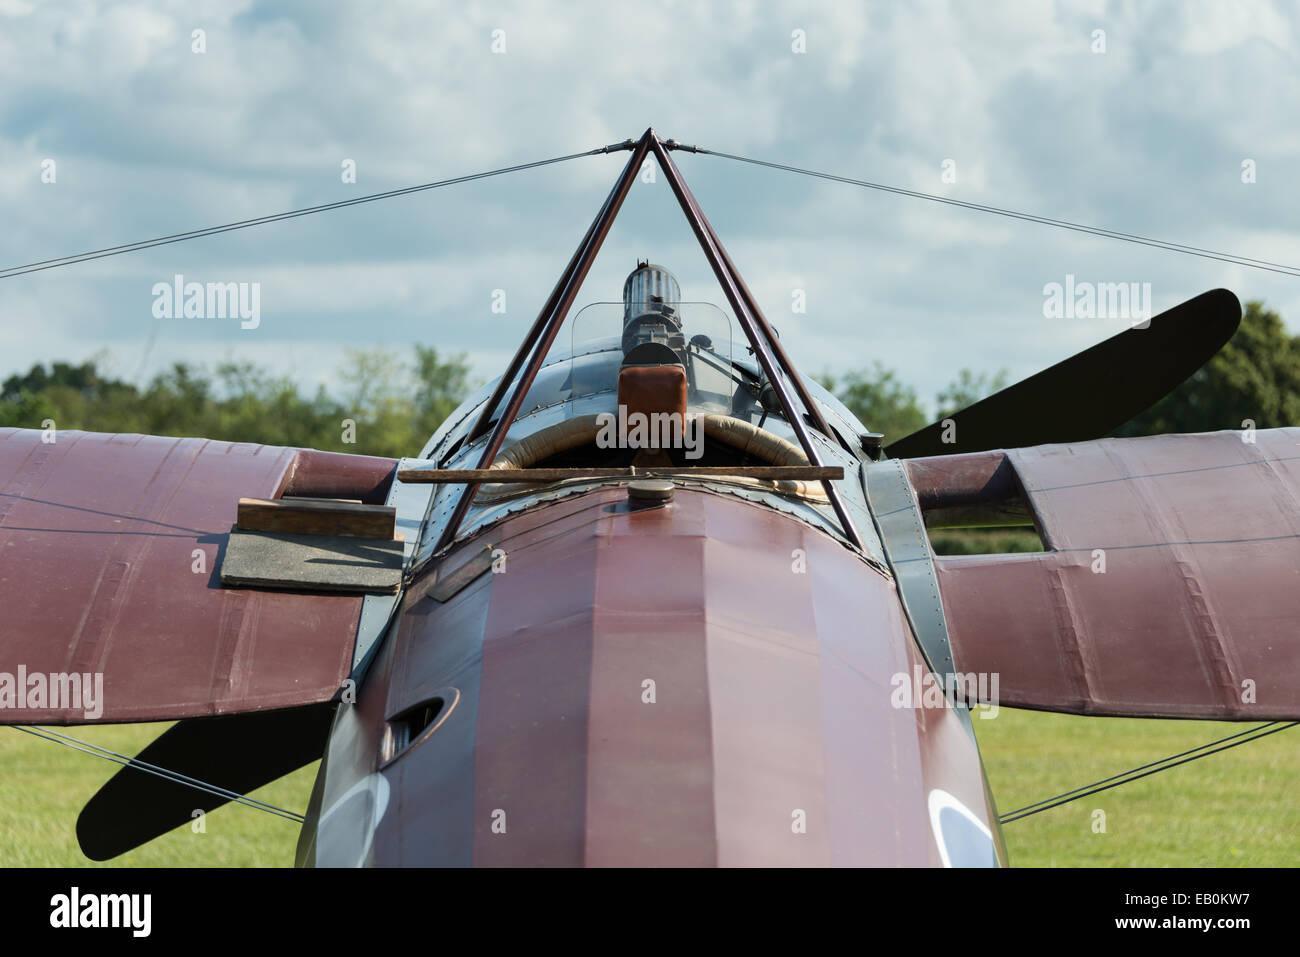 World War 1 fighter, forward  cockpit view - Stock Image